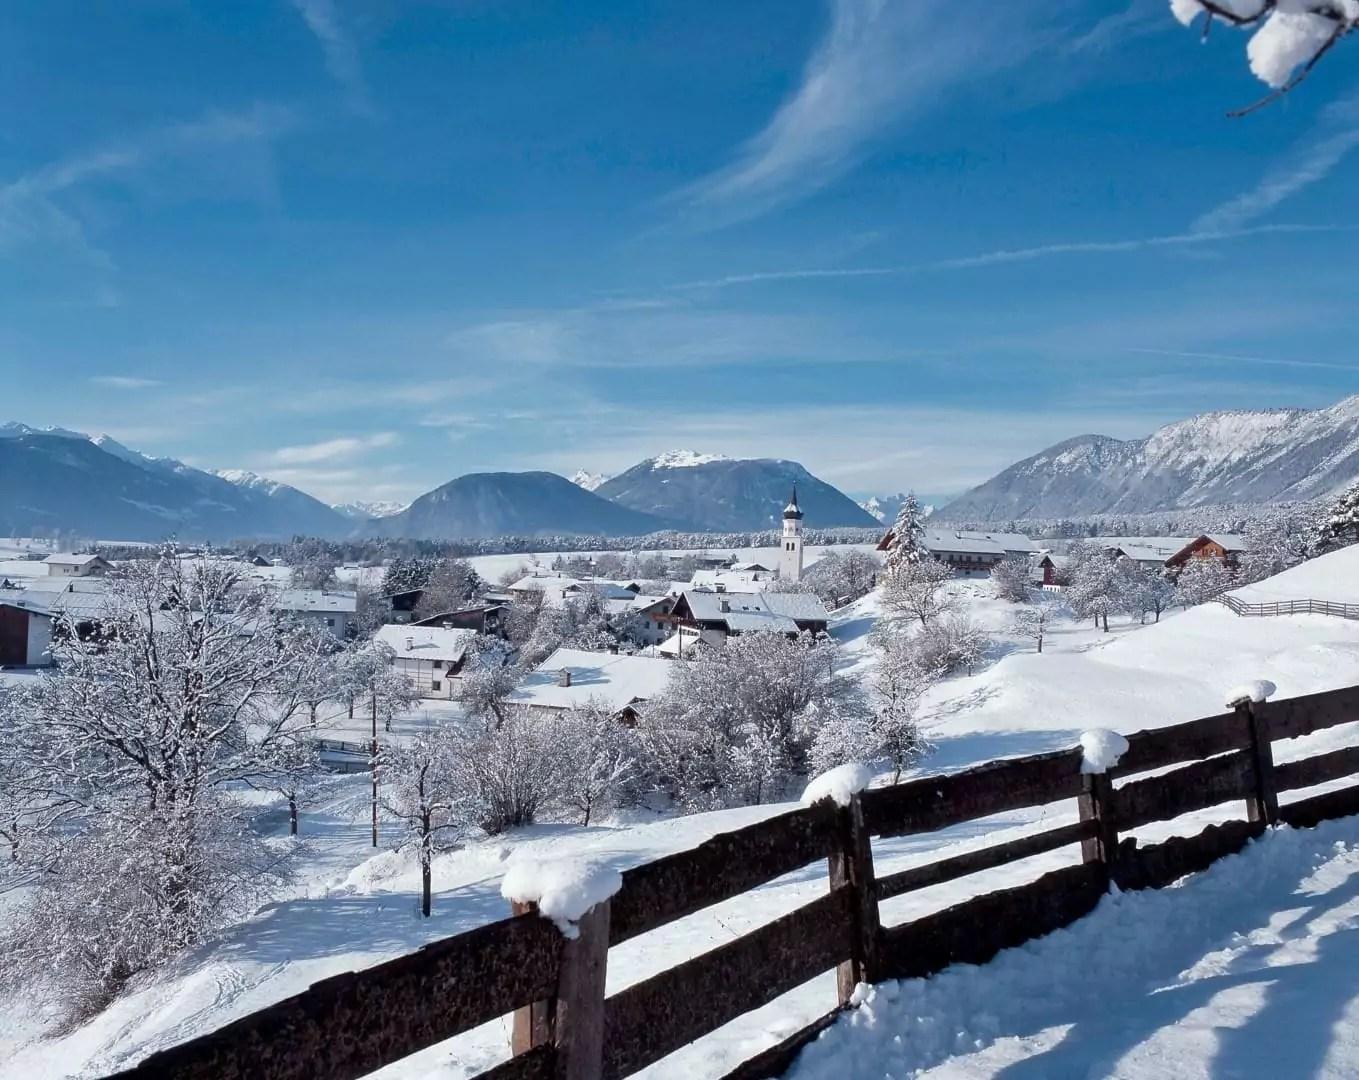 wintersport en aanbiedingen in Mieming